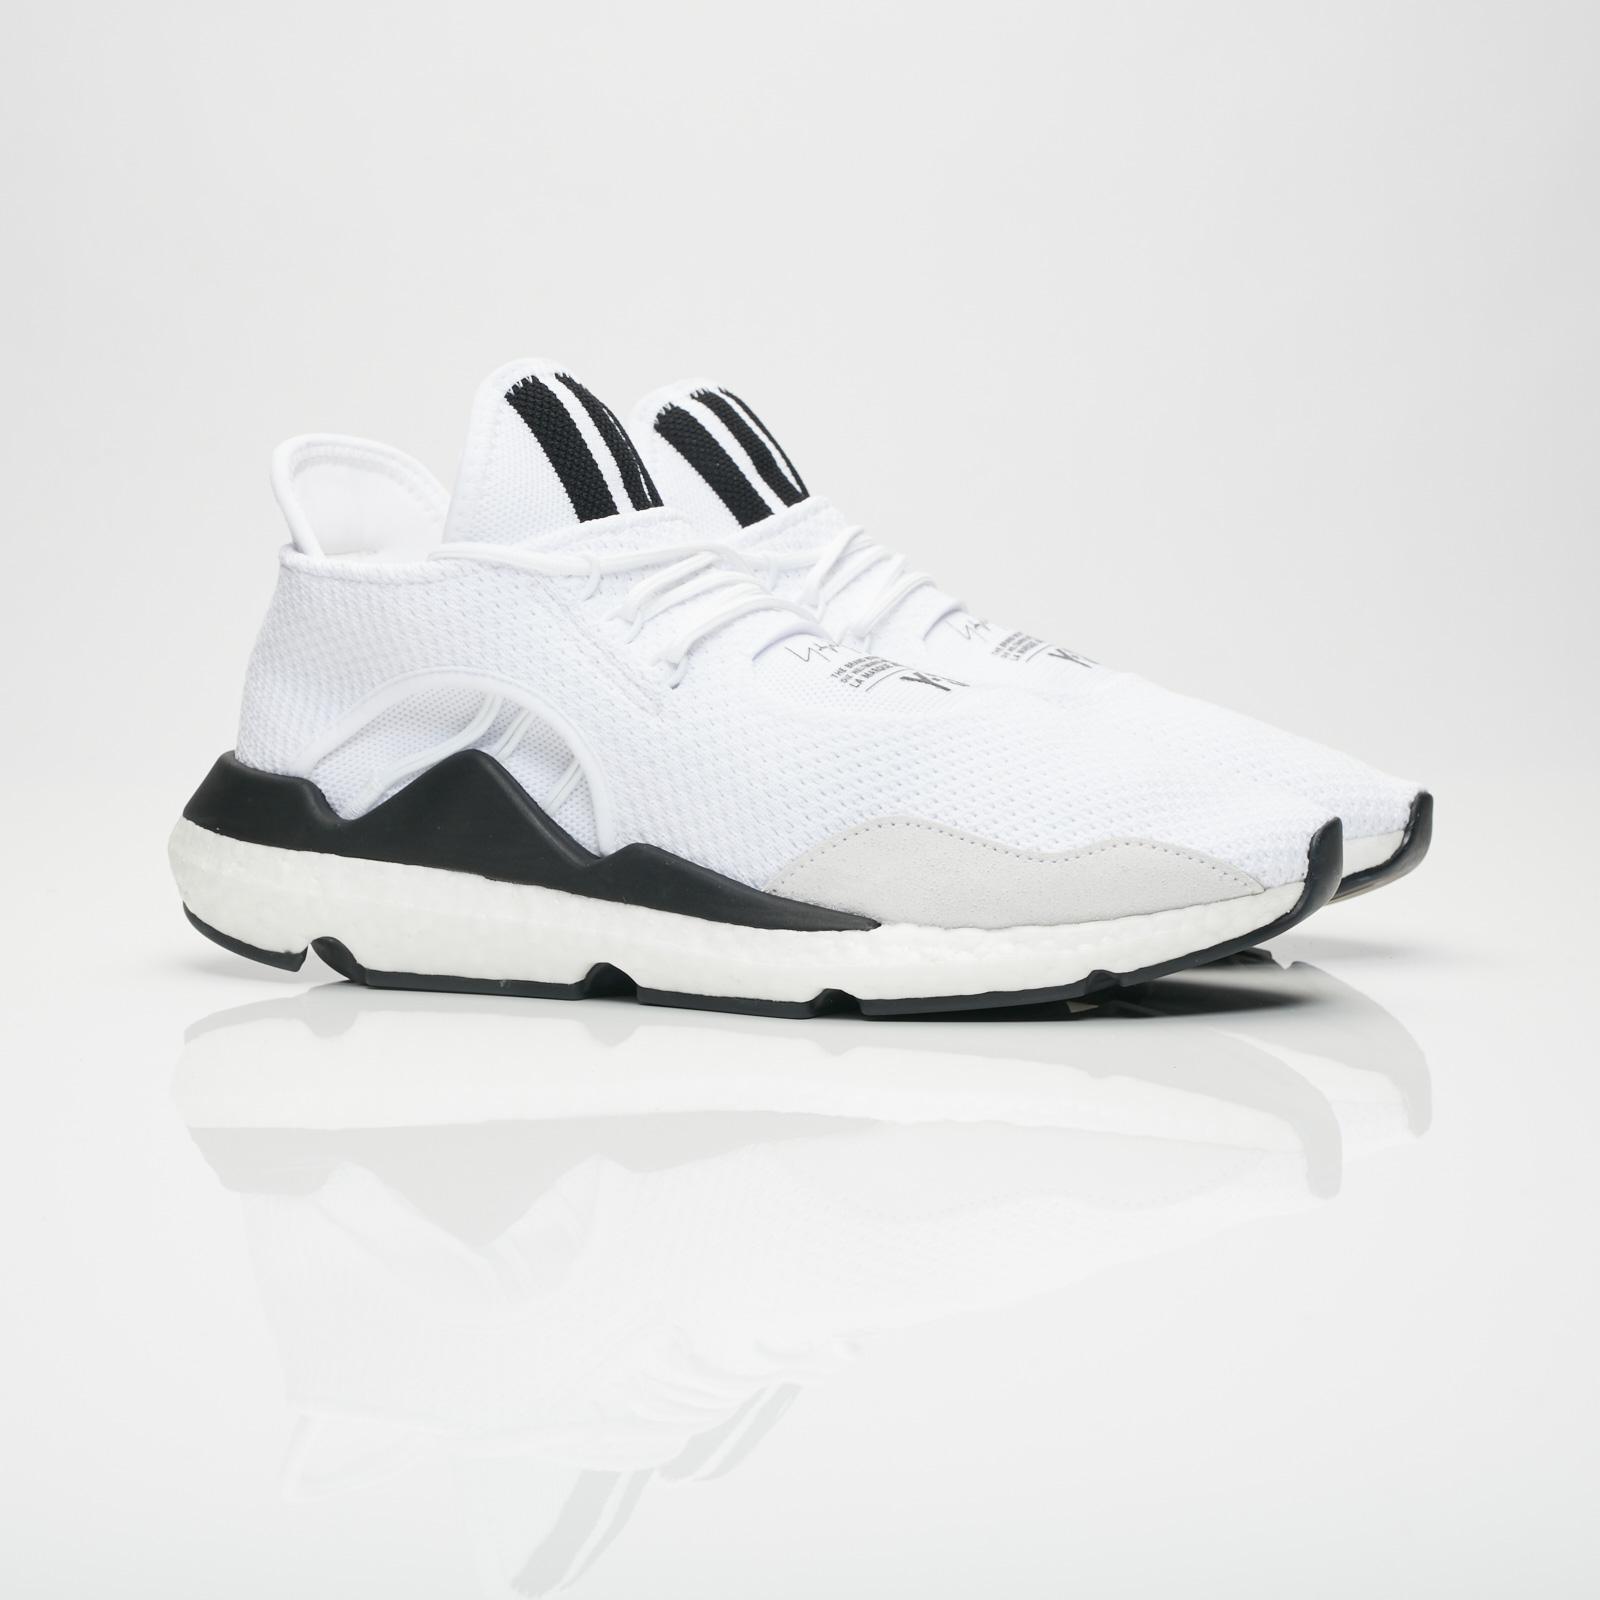 d35754f67 adidas Saikou - Ac7195 - Sneakersnstuff